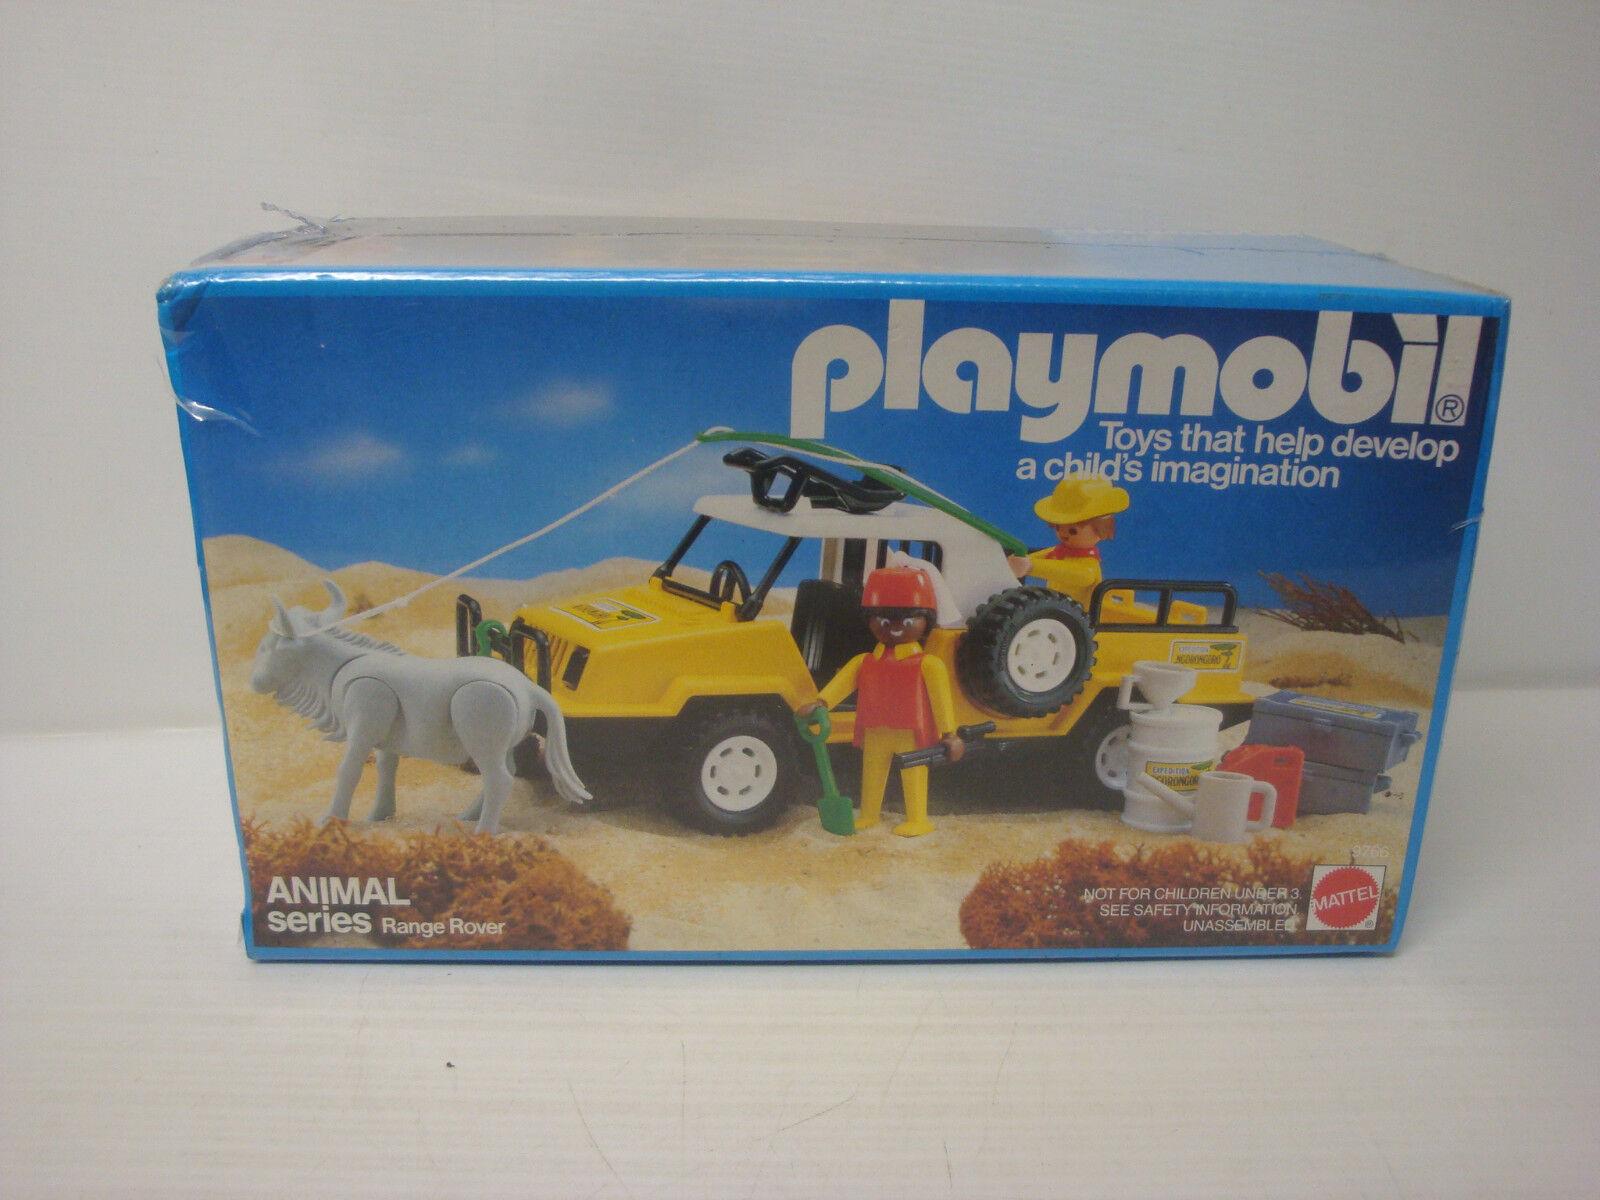 Playmobil ancien Mattel état neuf en boite scellée - jeep safari animal 9766